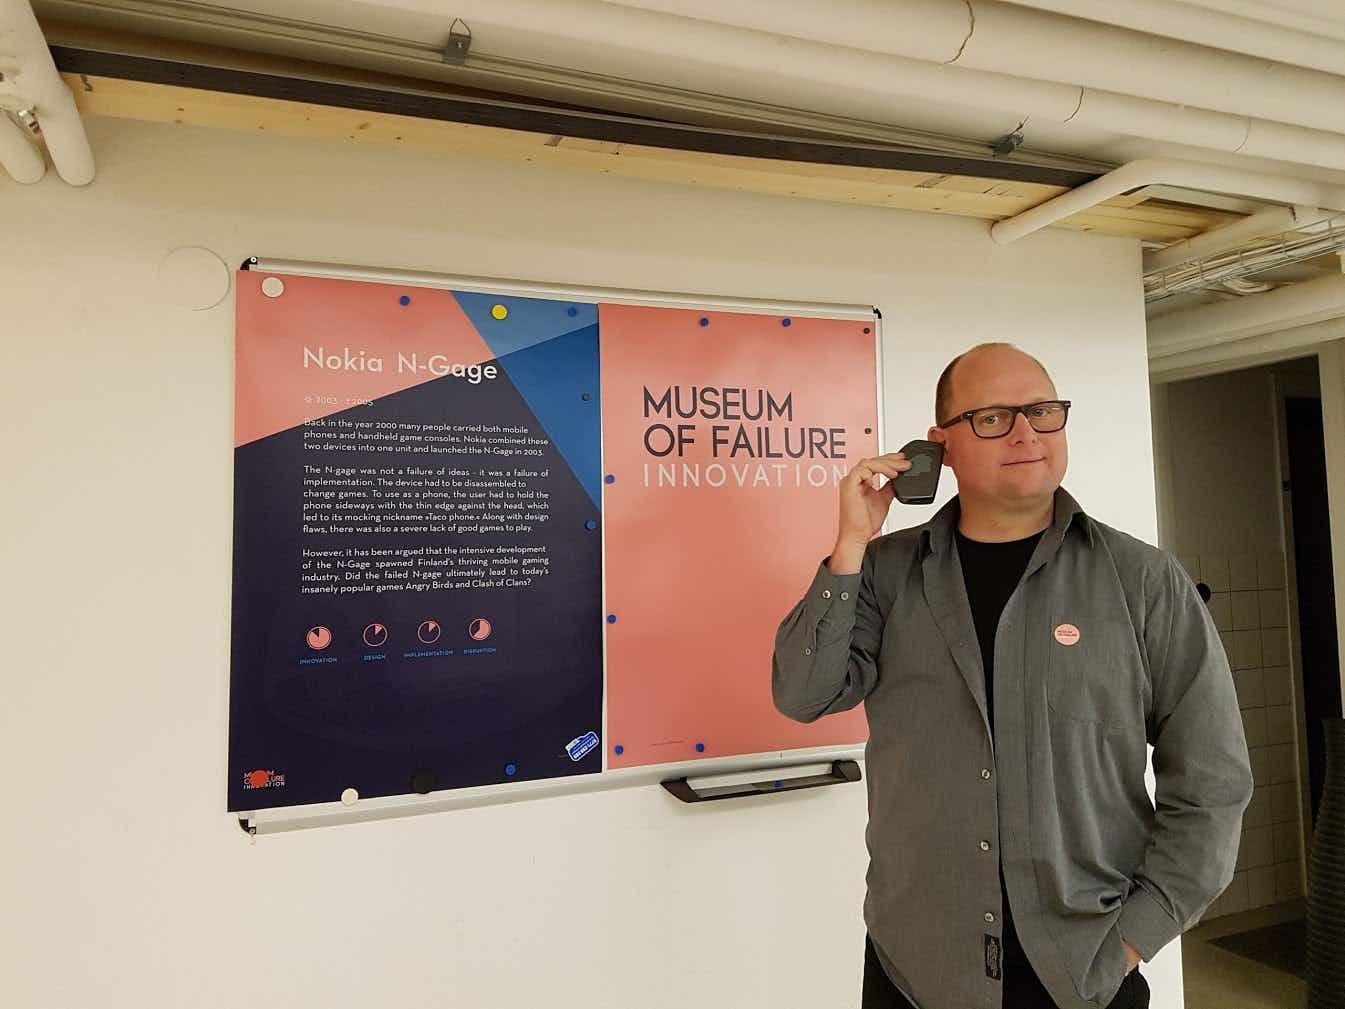 Sweden's Museum of Failure has been a resounding success